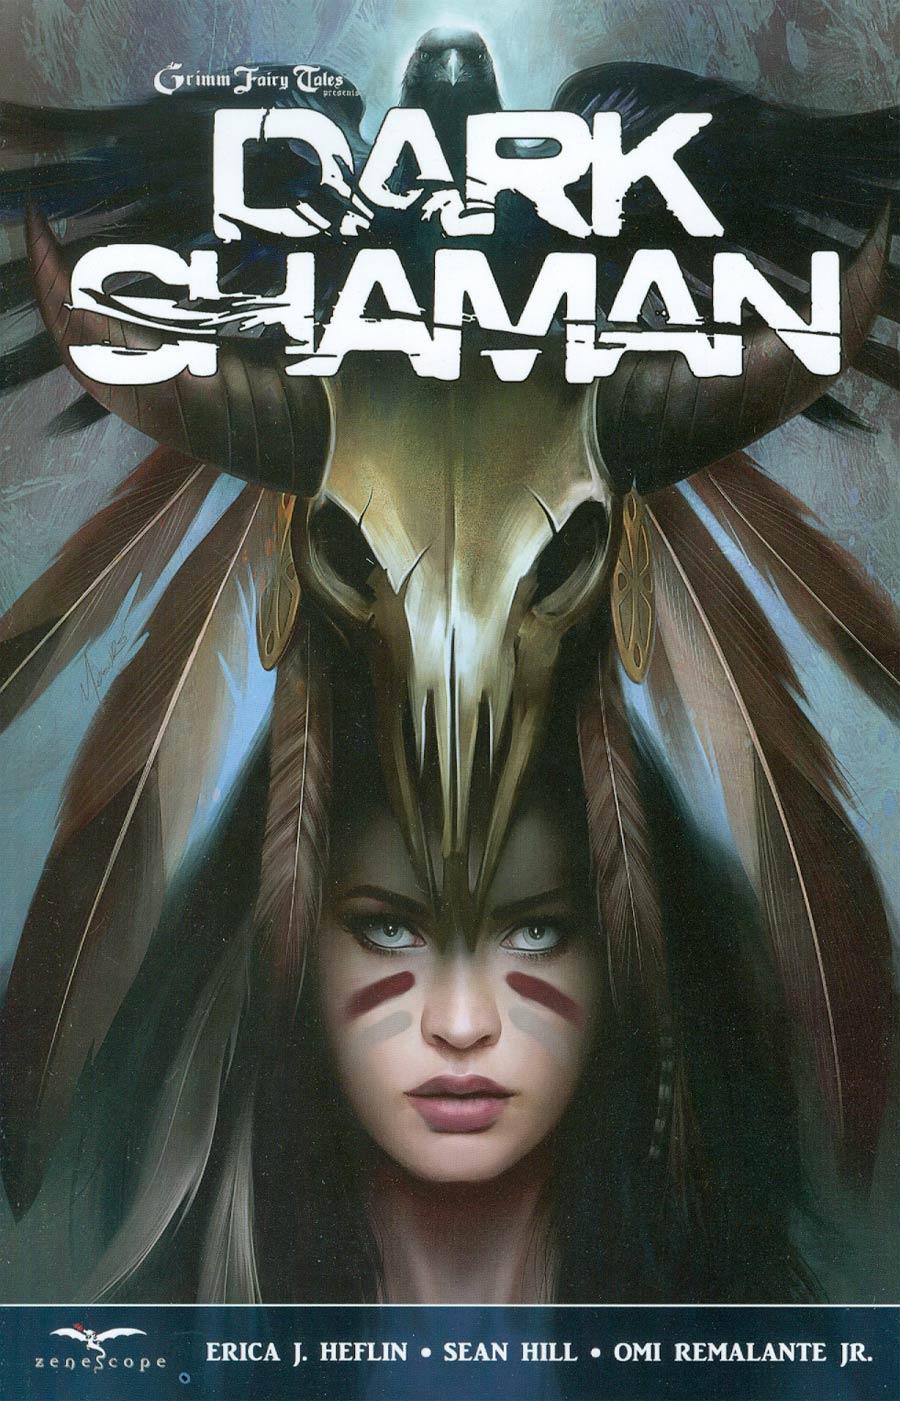 Grimm Fairy Tales Presents Dark Shaman Vol 1 TP